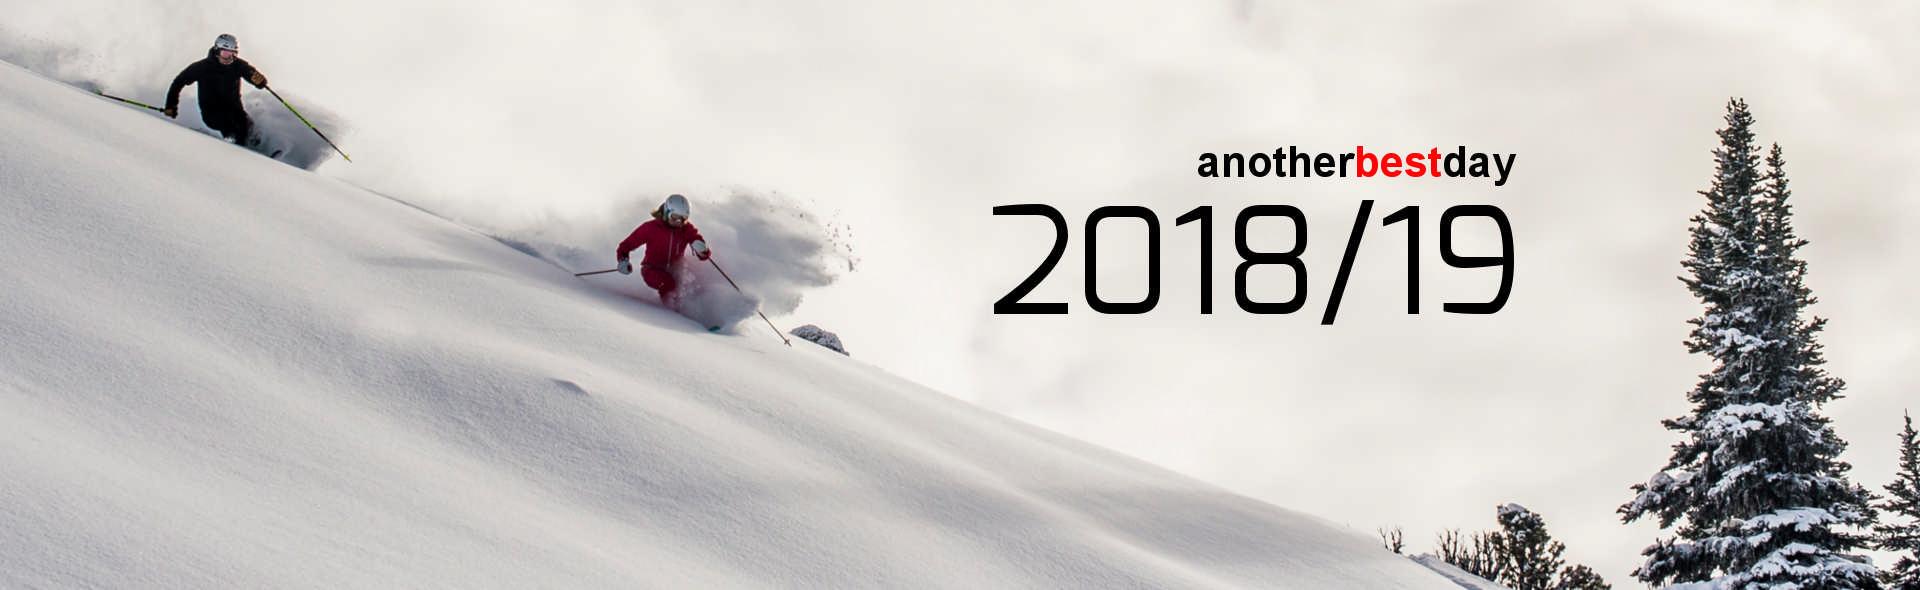 d710c1b40 Rossignol - Lyže, bežky, lyžiarky, snowboard